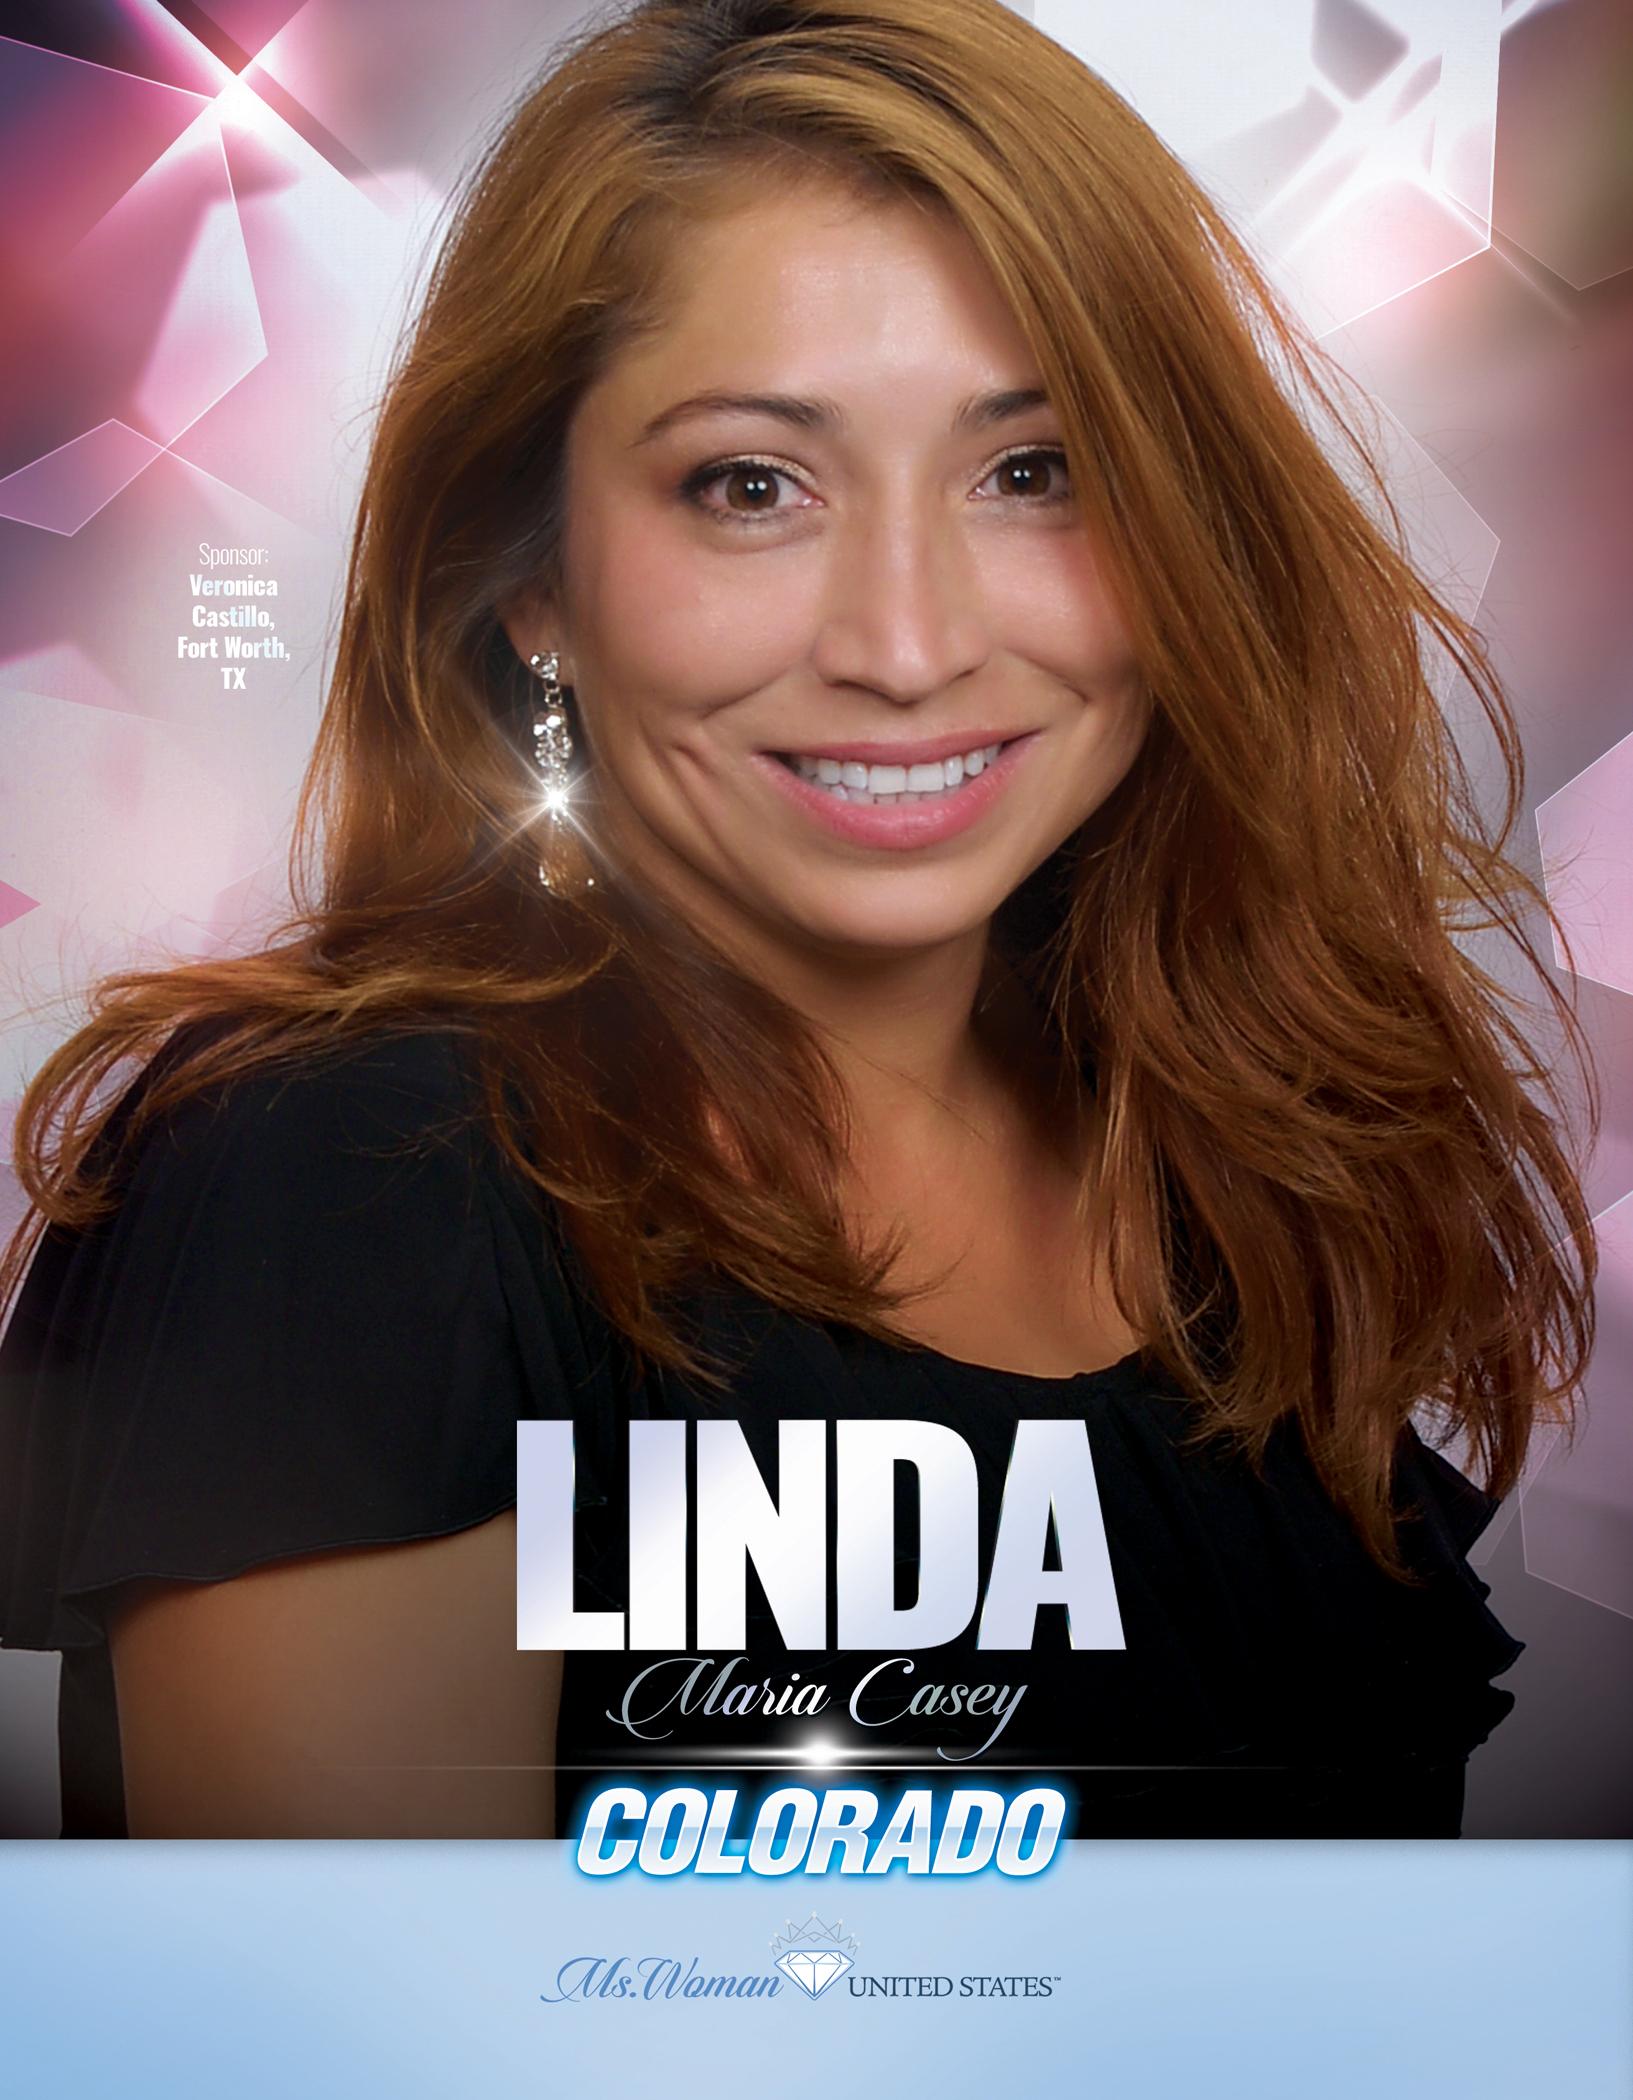 Linda Casey Ms. Woman Colorado United States - 2019